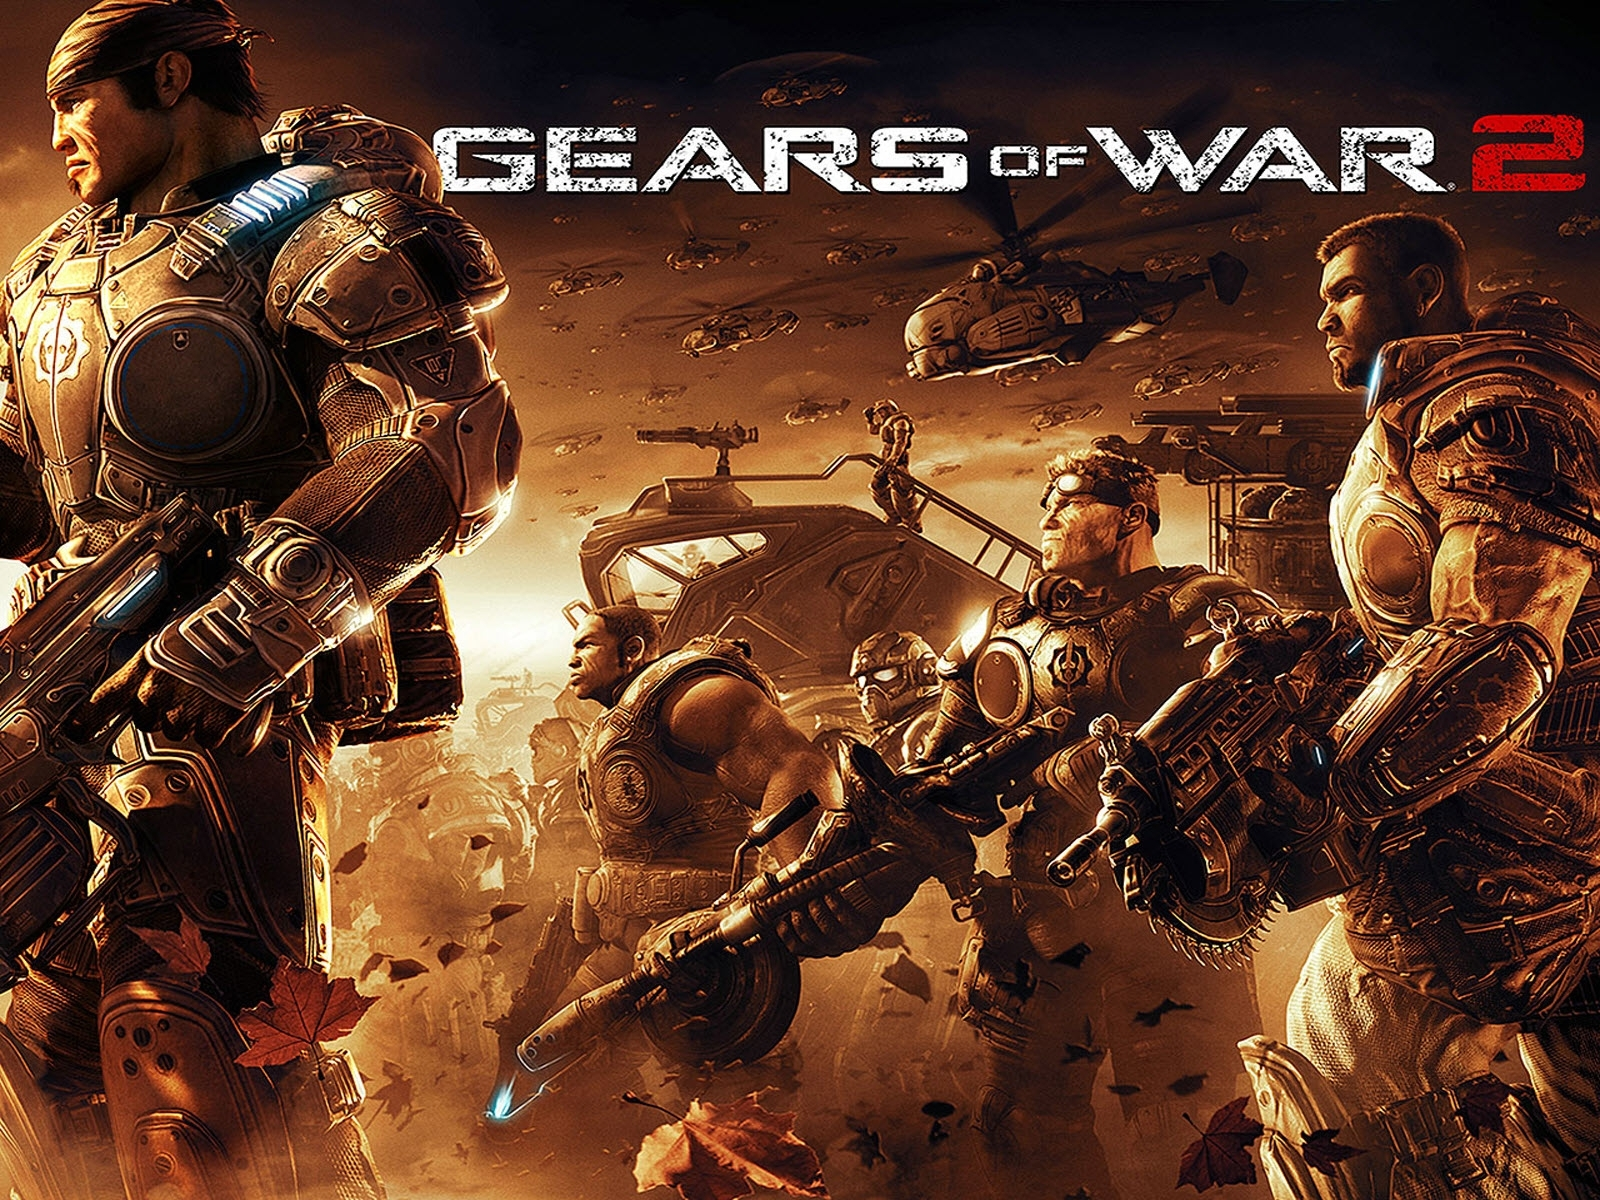 gears of war 2 wallpapers | hd wallpapers | id #8149